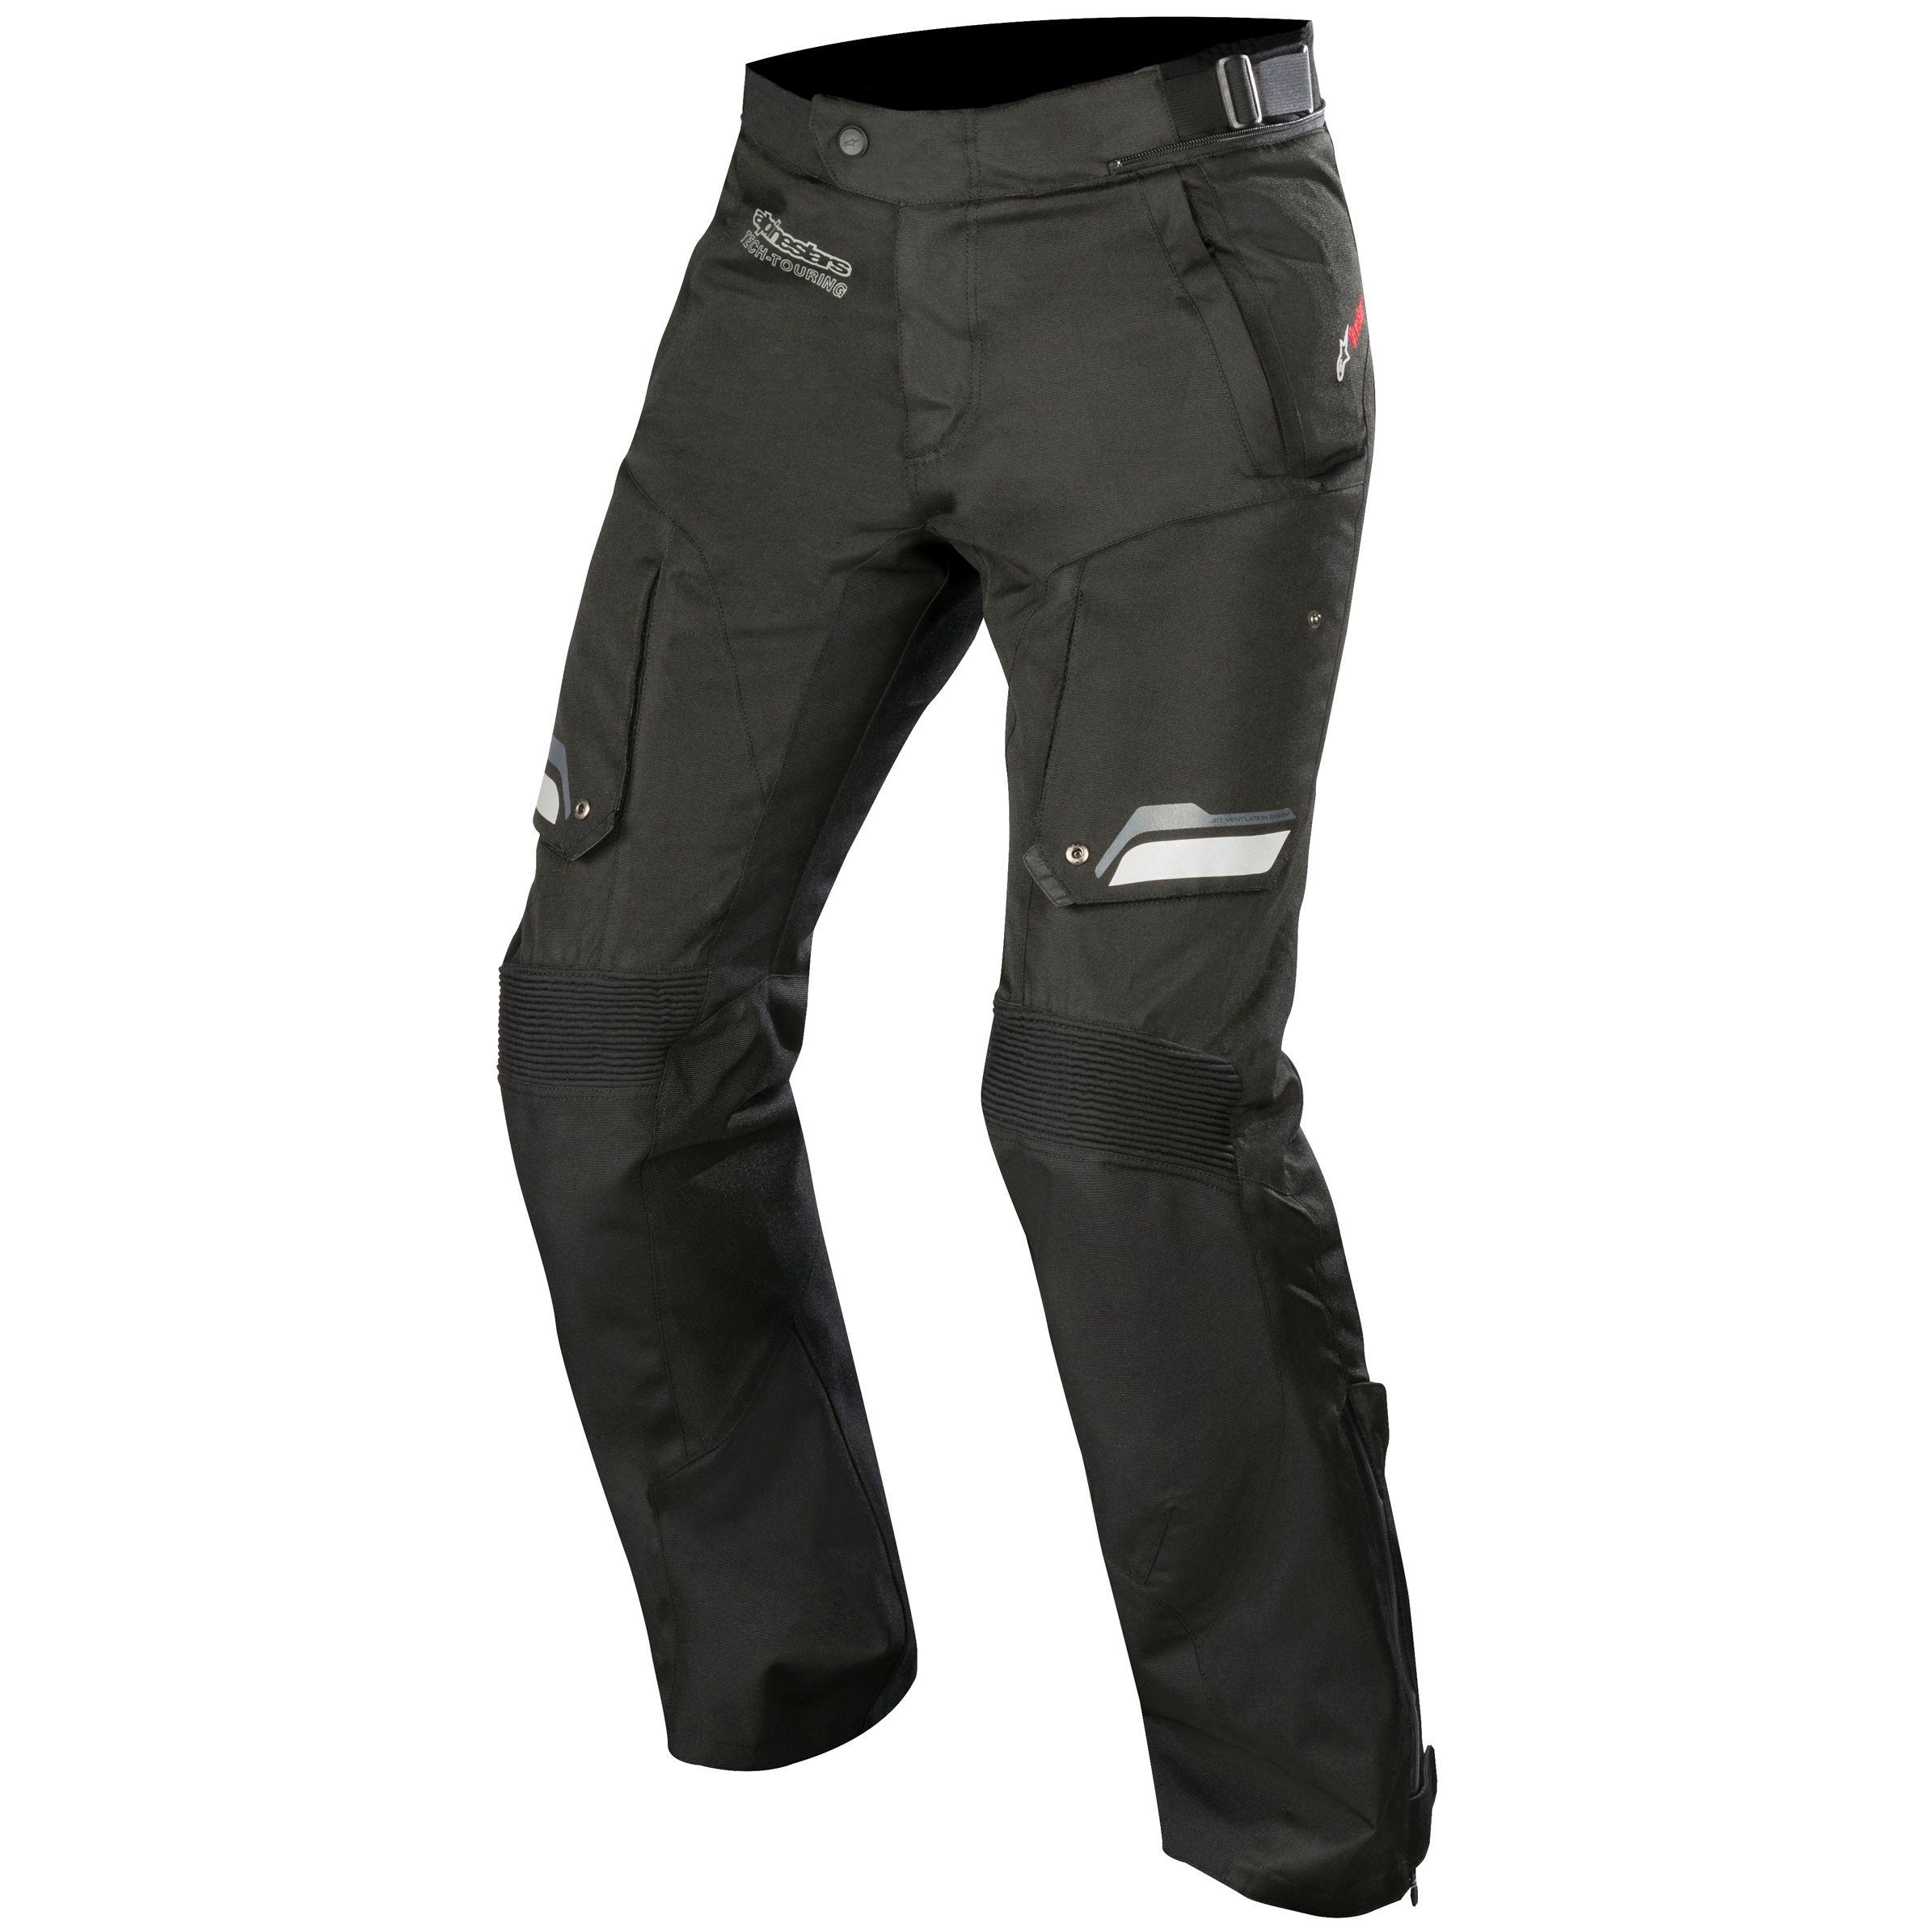 Pantalon Alpinestars Bogota V2 Drystar Version Jambes Courtes